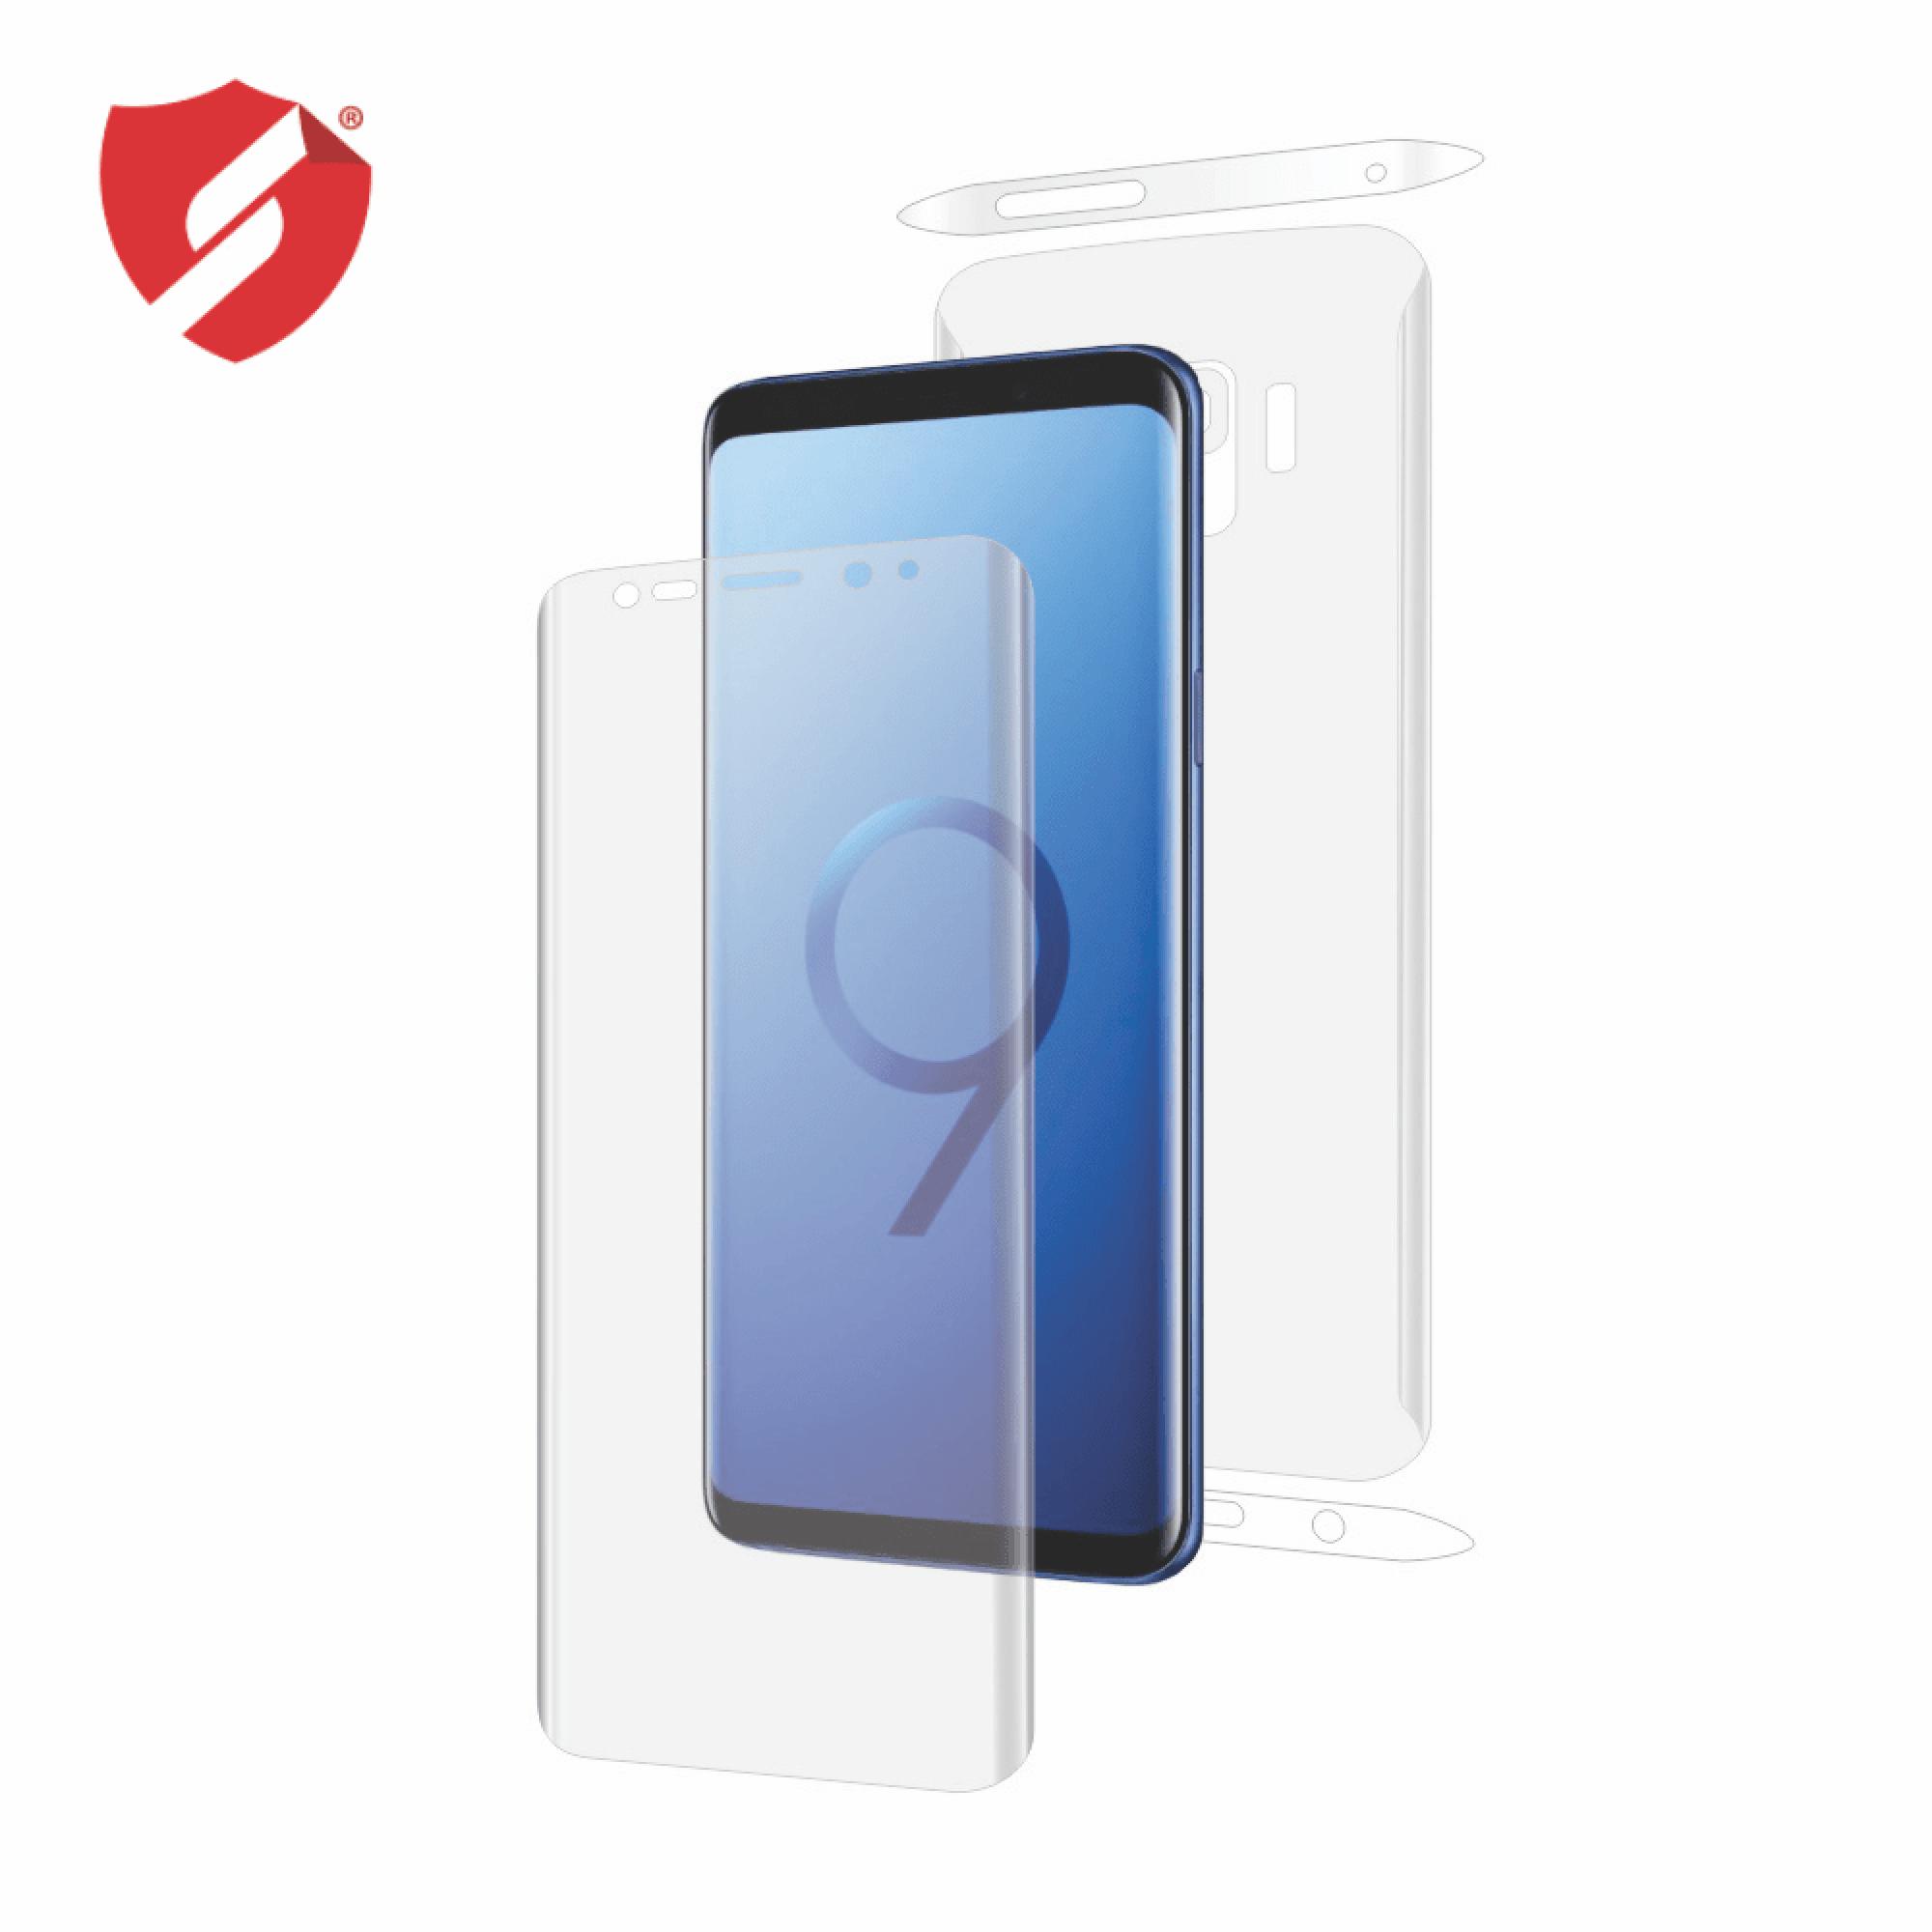 Folie de protectie Smart Protection Samsung Galaxy S9 compatibila cu carcasa Samsung Silicone Cover - fullbody - display + spate + laterale imagine